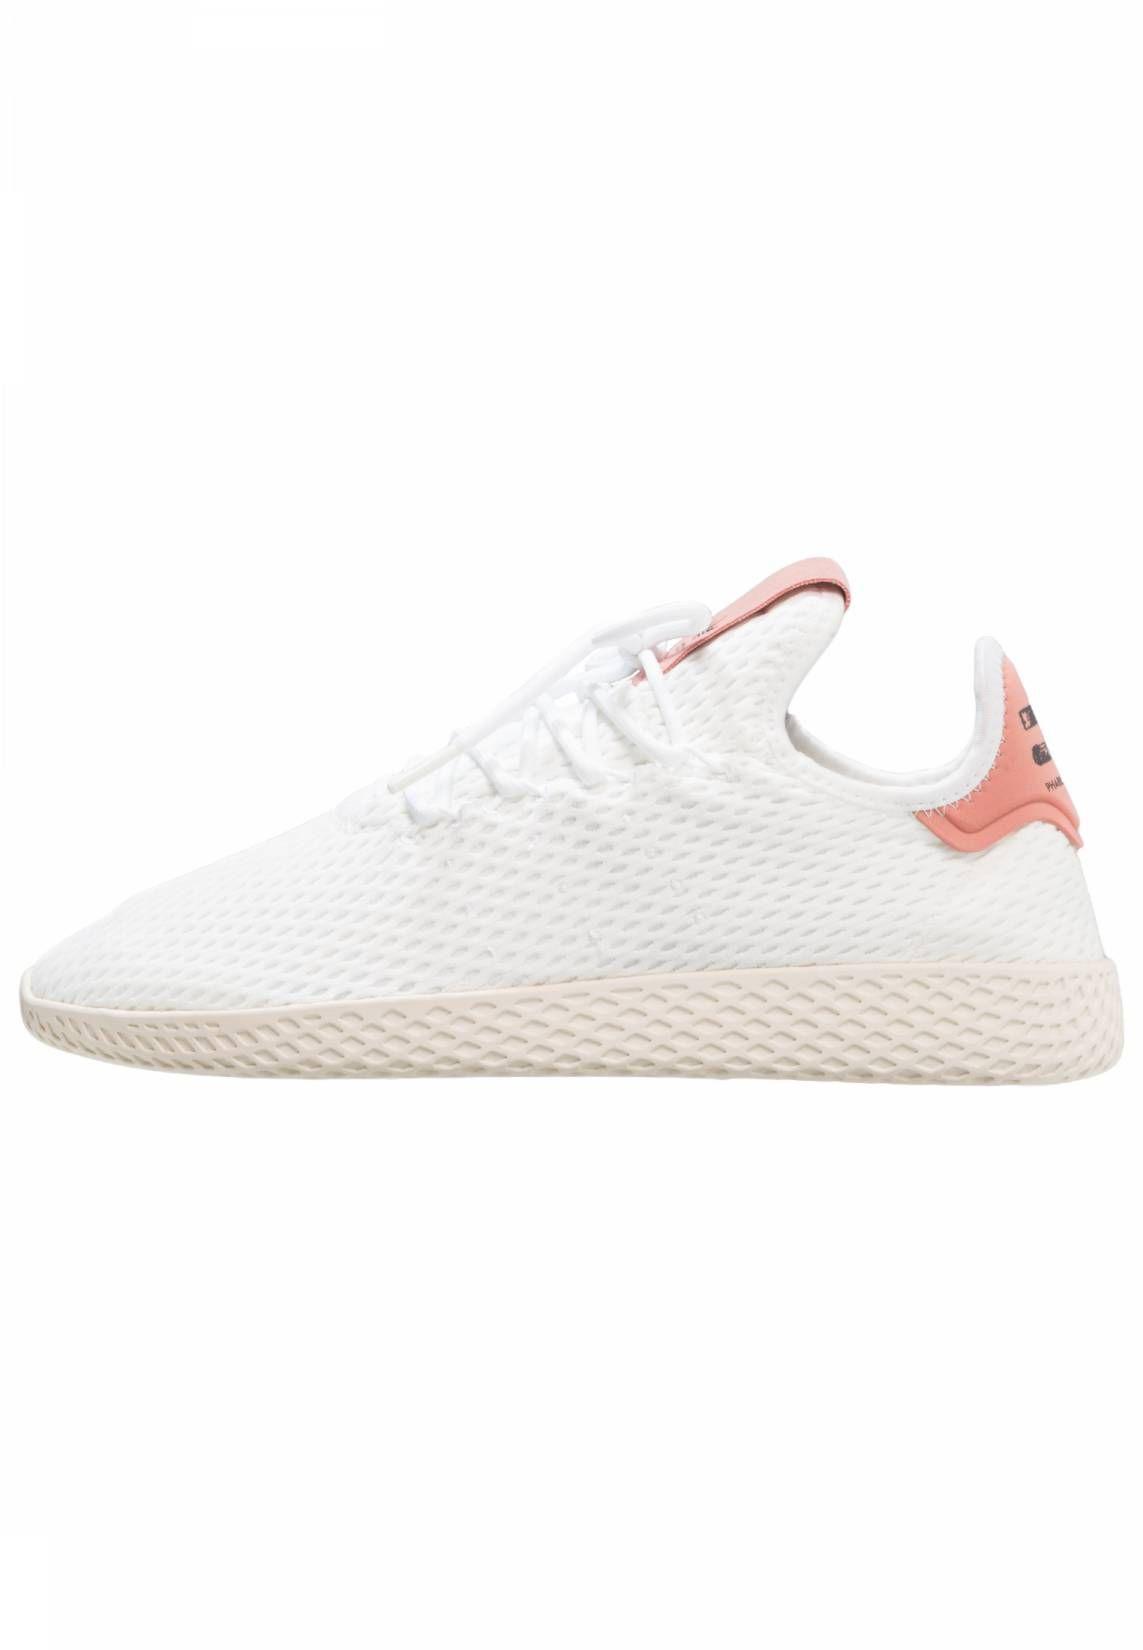 Adidas Originals Pw Tennis Hu Sneaker Low White Raw Pink Sohle Kunststoff Decksohle Textil Innenmaterial Textil Oberm Adidas Originals Sneaker Zalando